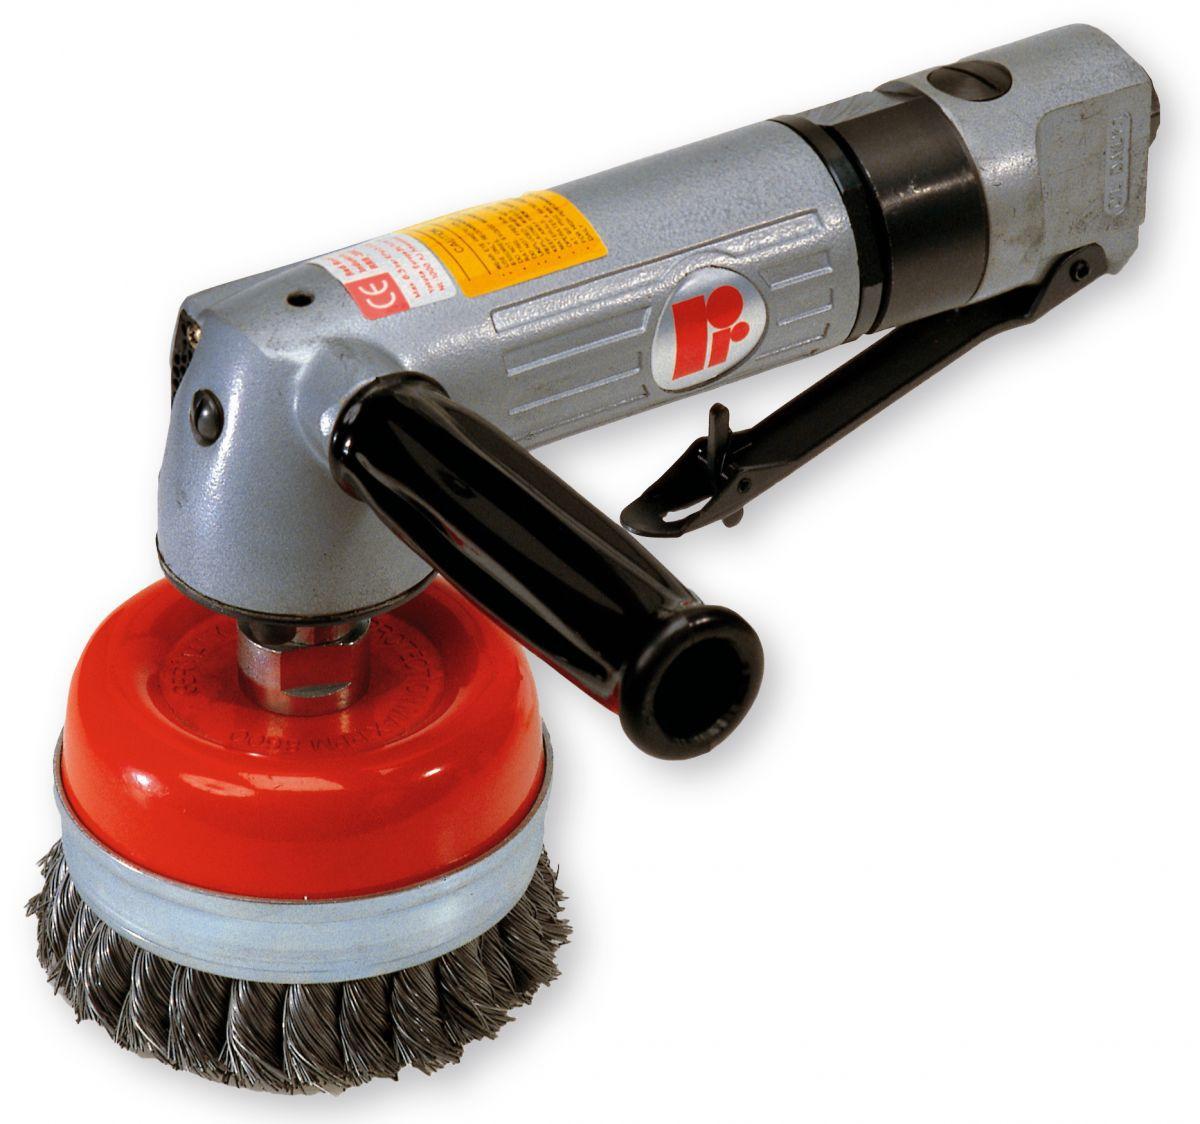 rrb280 rotary brush sander